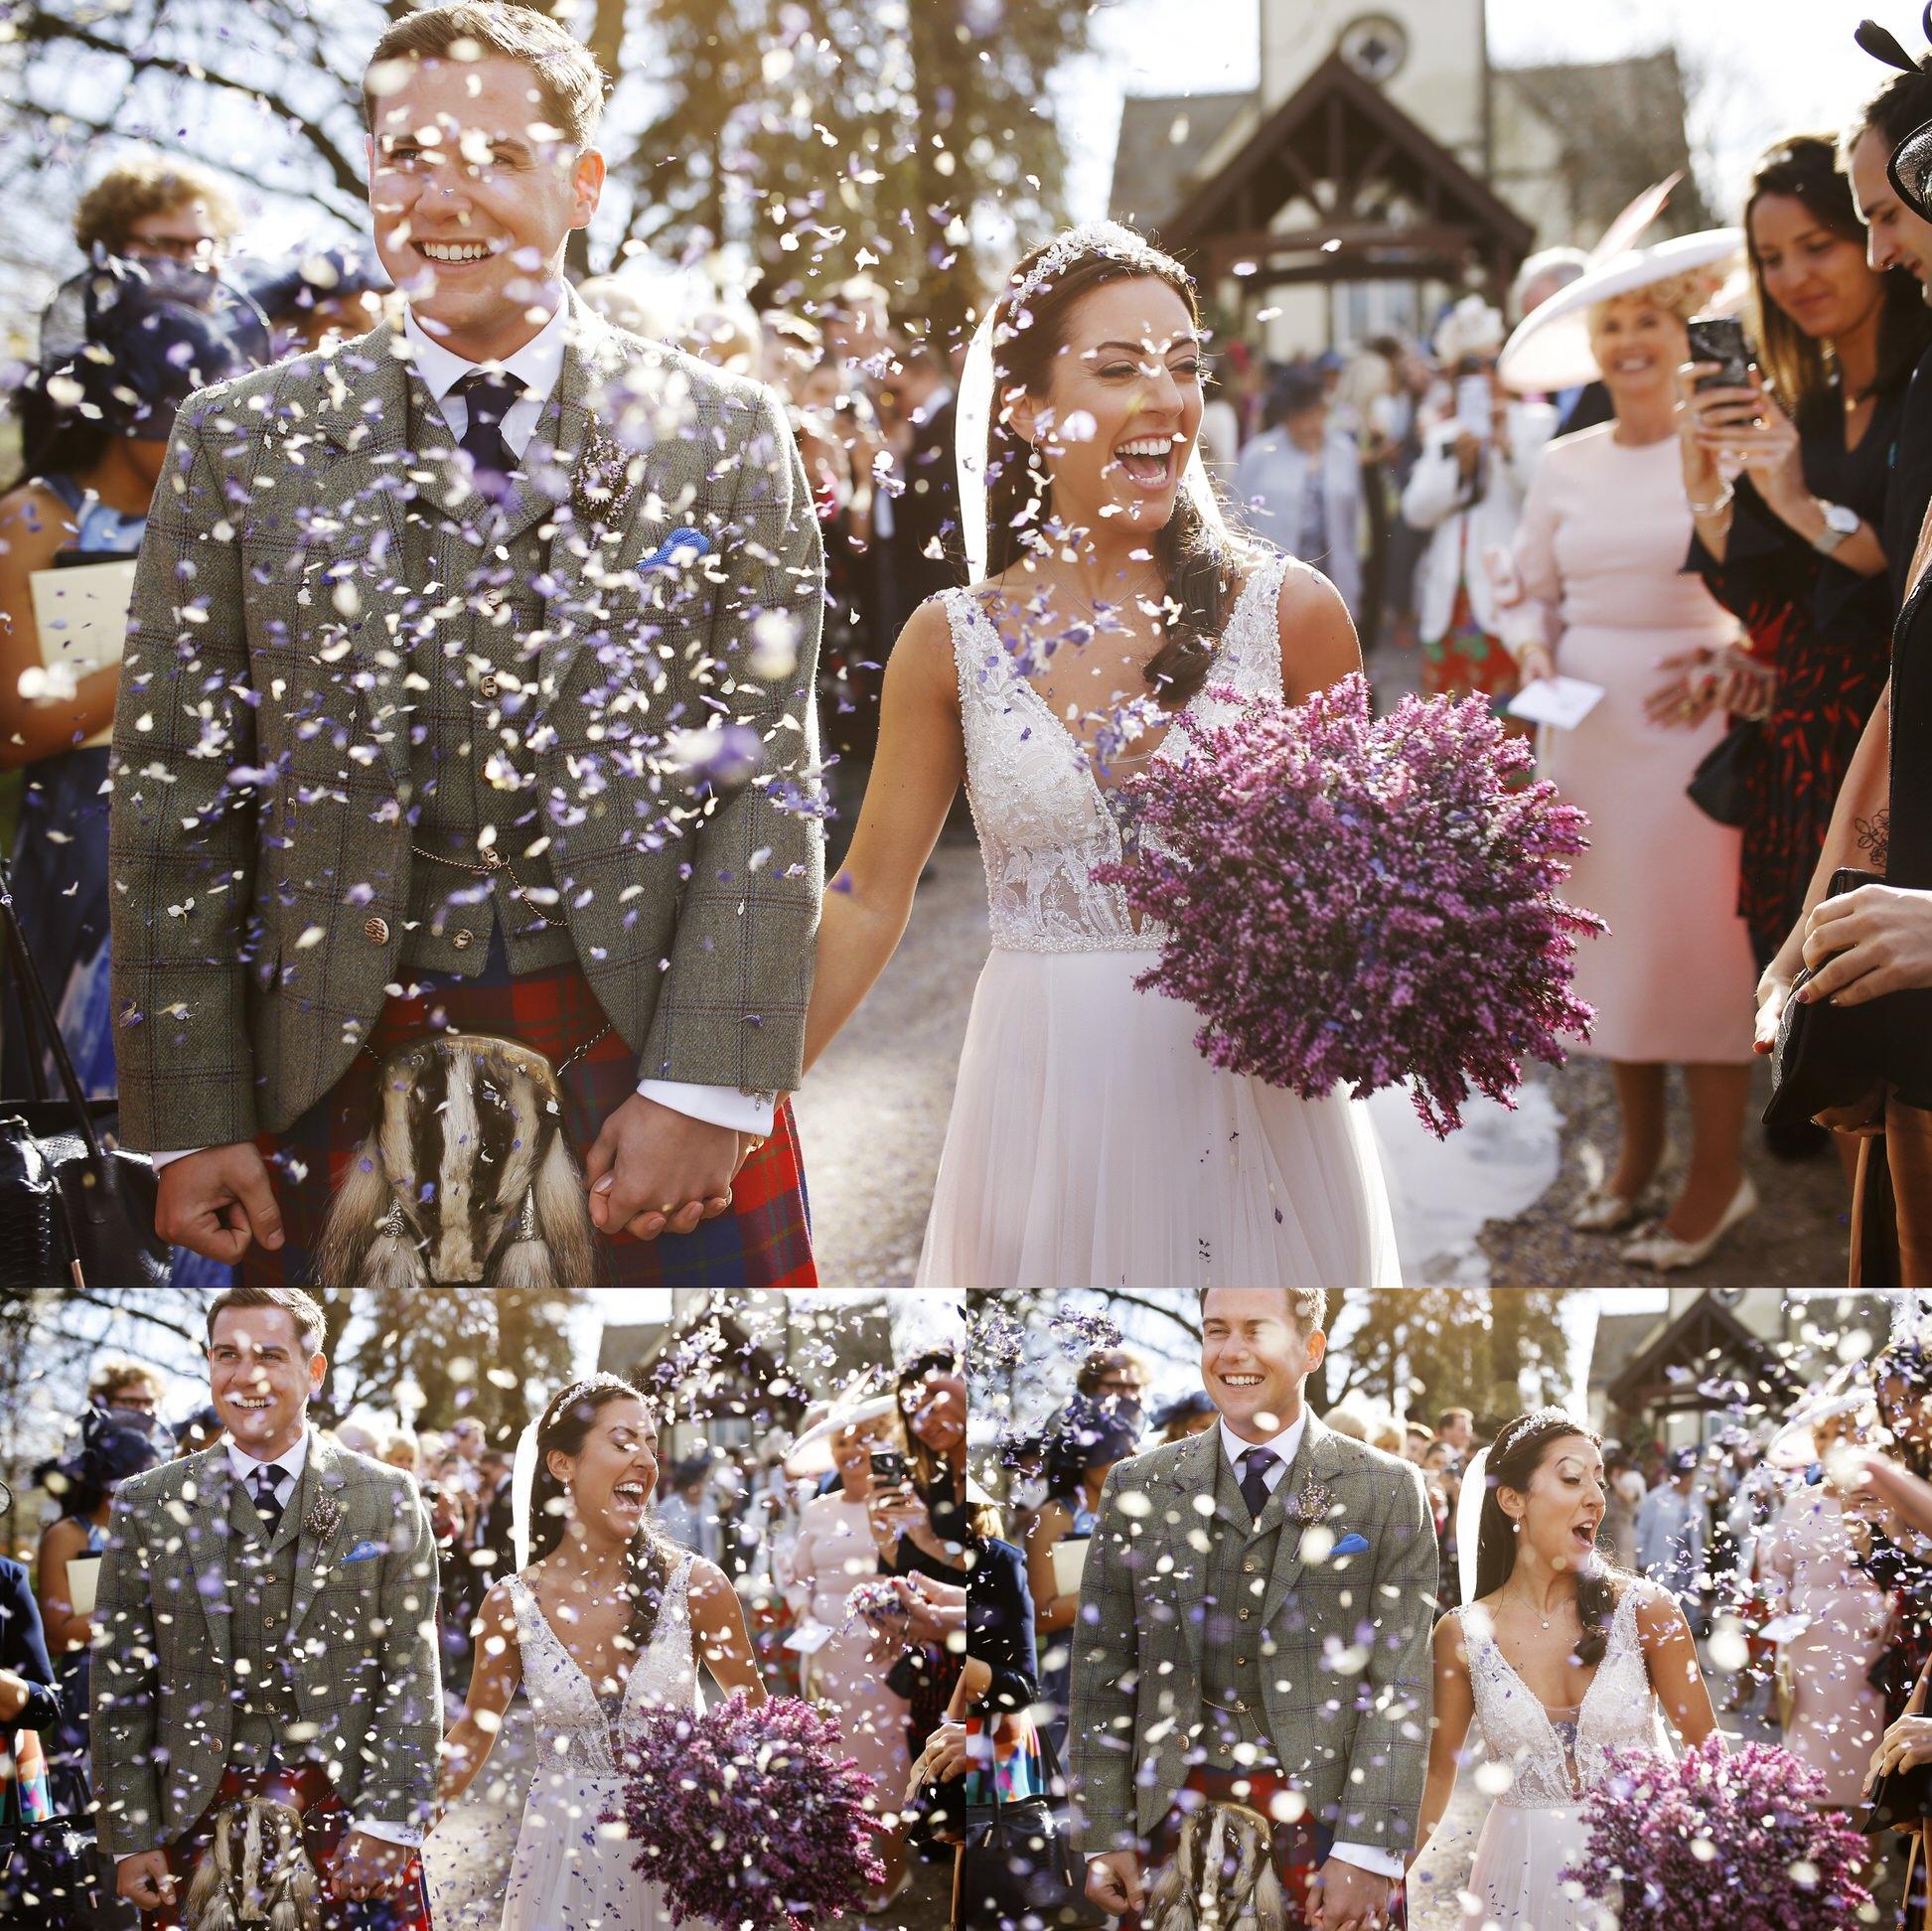 brett-harkness-cotland-wedding-photographer-highland-wedding_0020.jpg